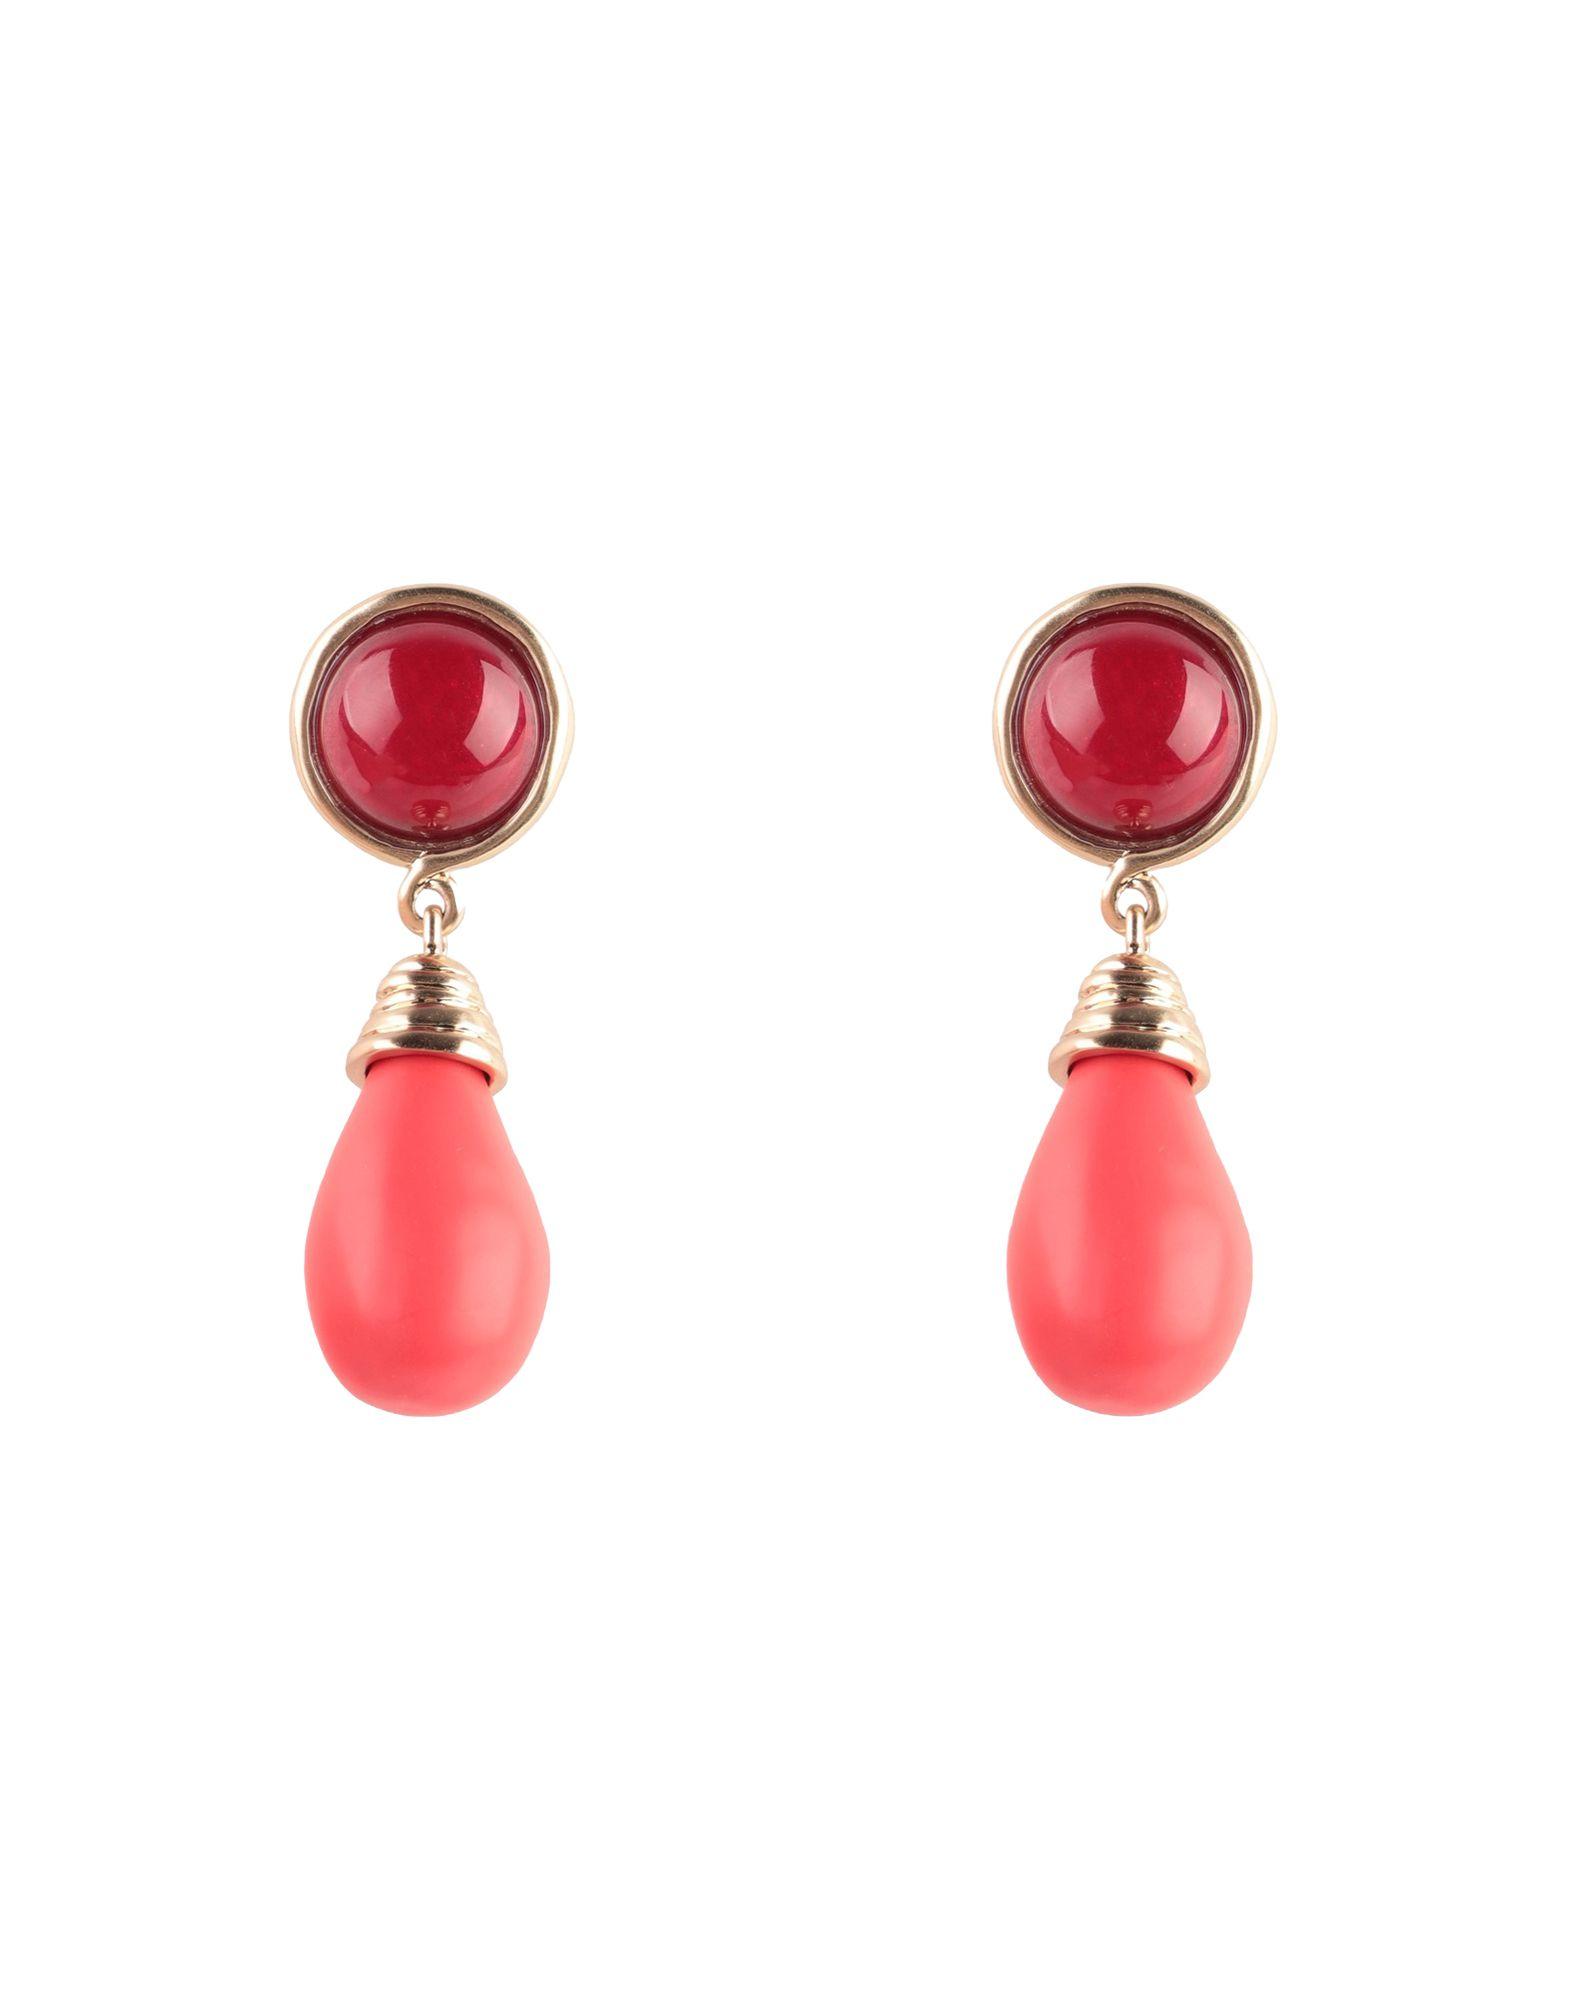 TORY BURCH Earrings - Item 50245329